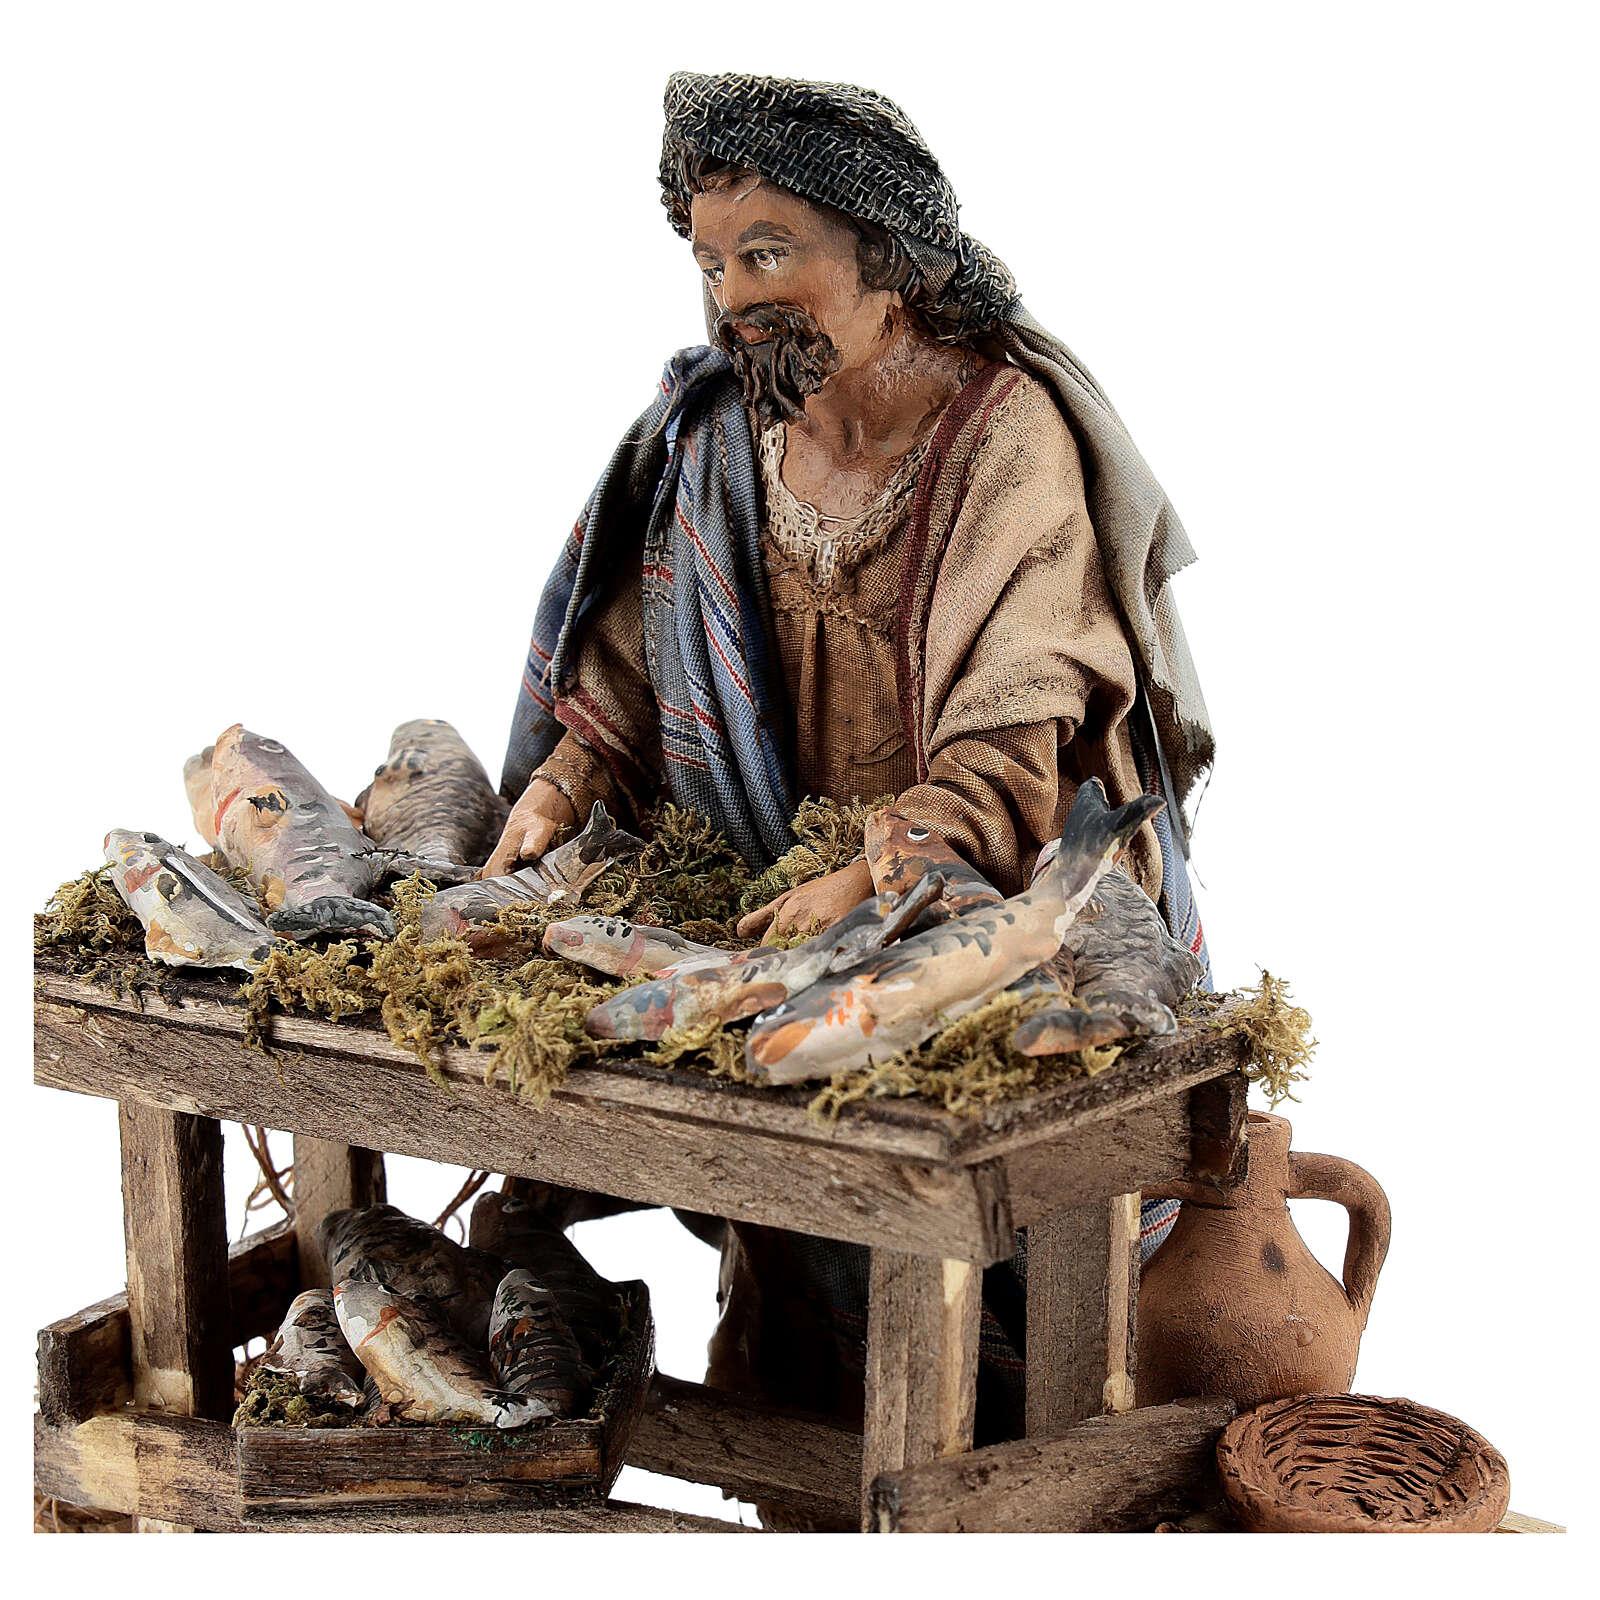 Nativity scene figurine, Fishmonger by Angela Tripi 13 cm 4